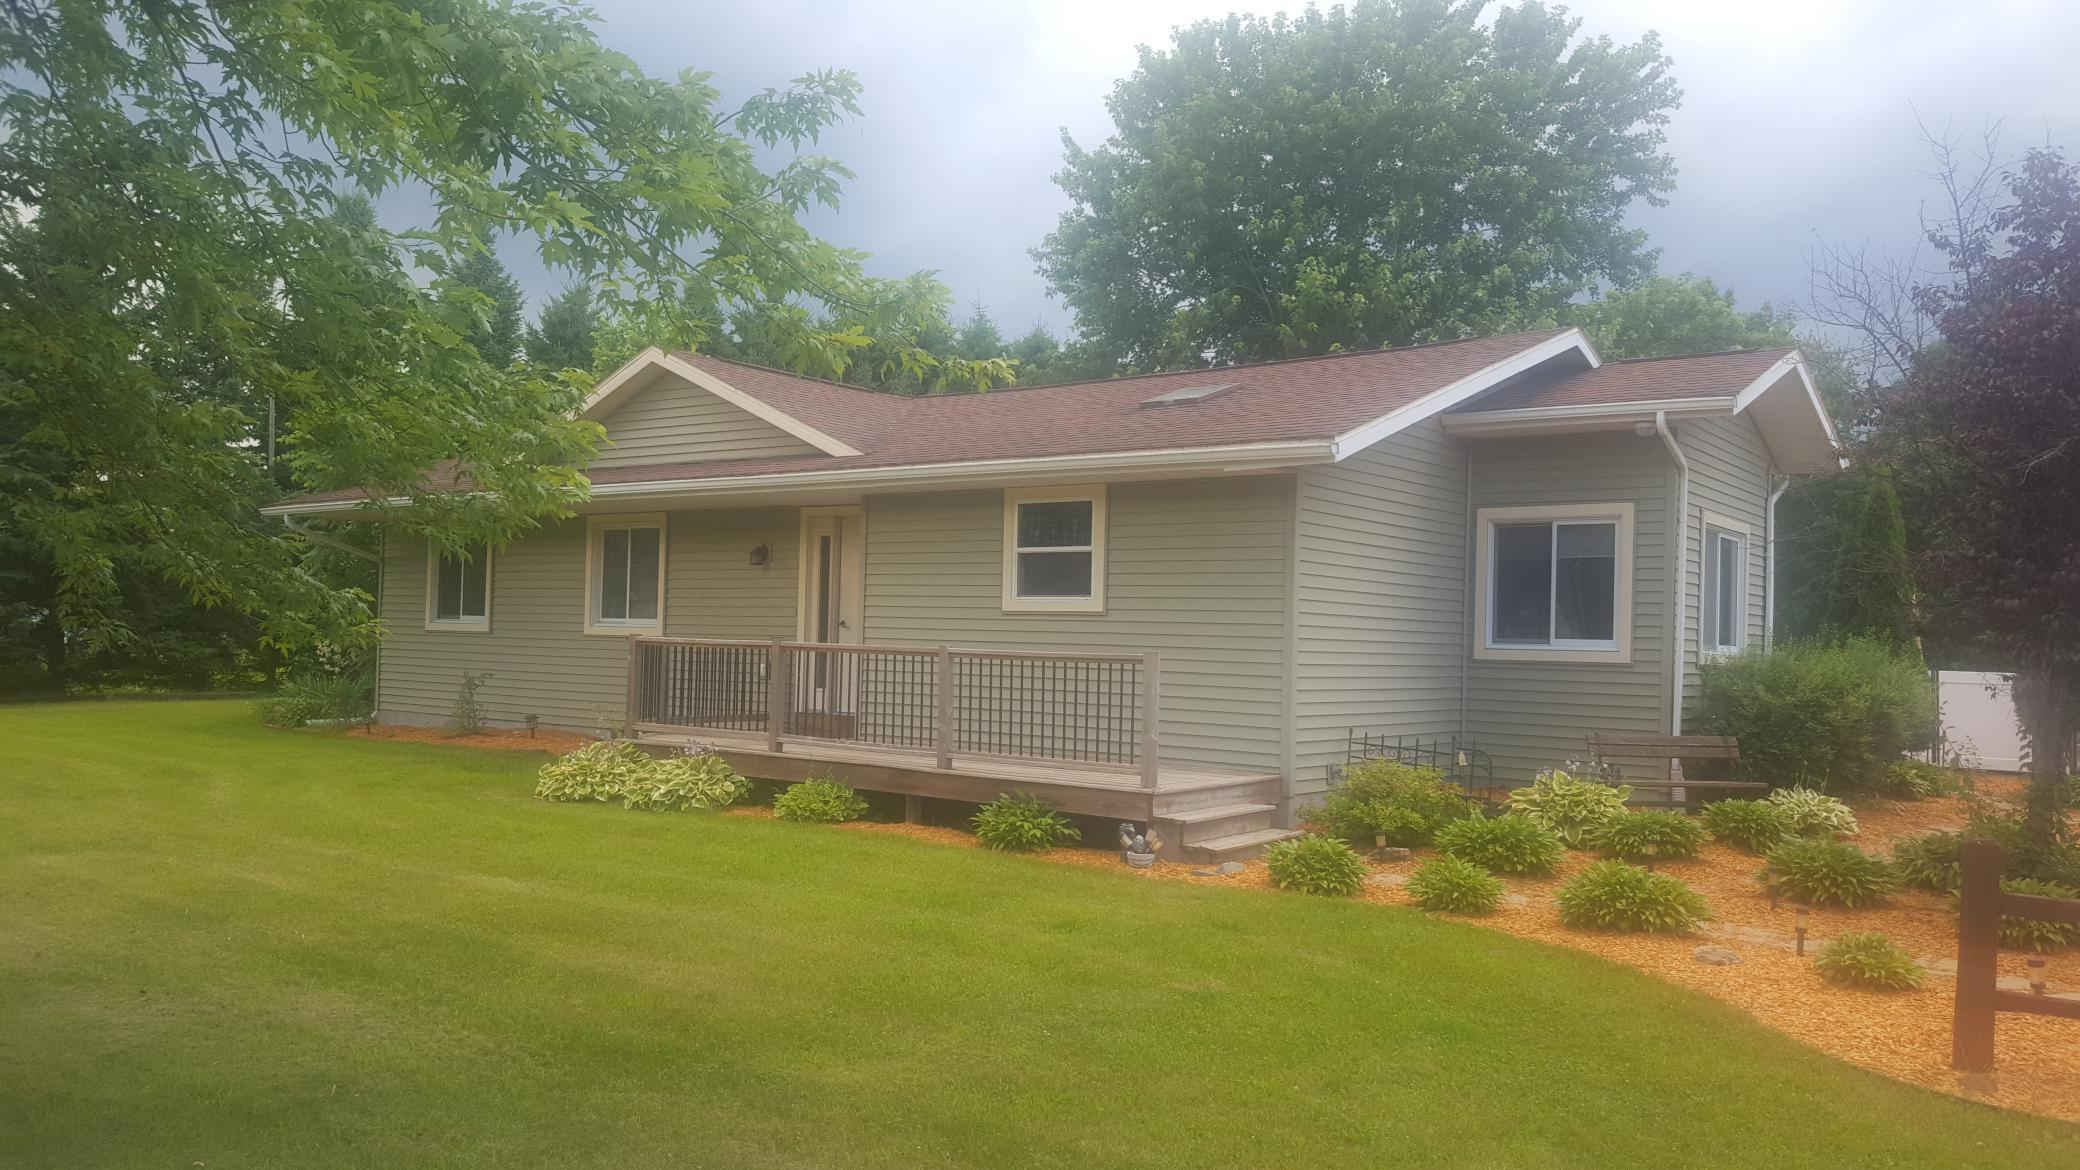 W8096 County Rd Z Property Photo - Onalaska, WI real estate listing